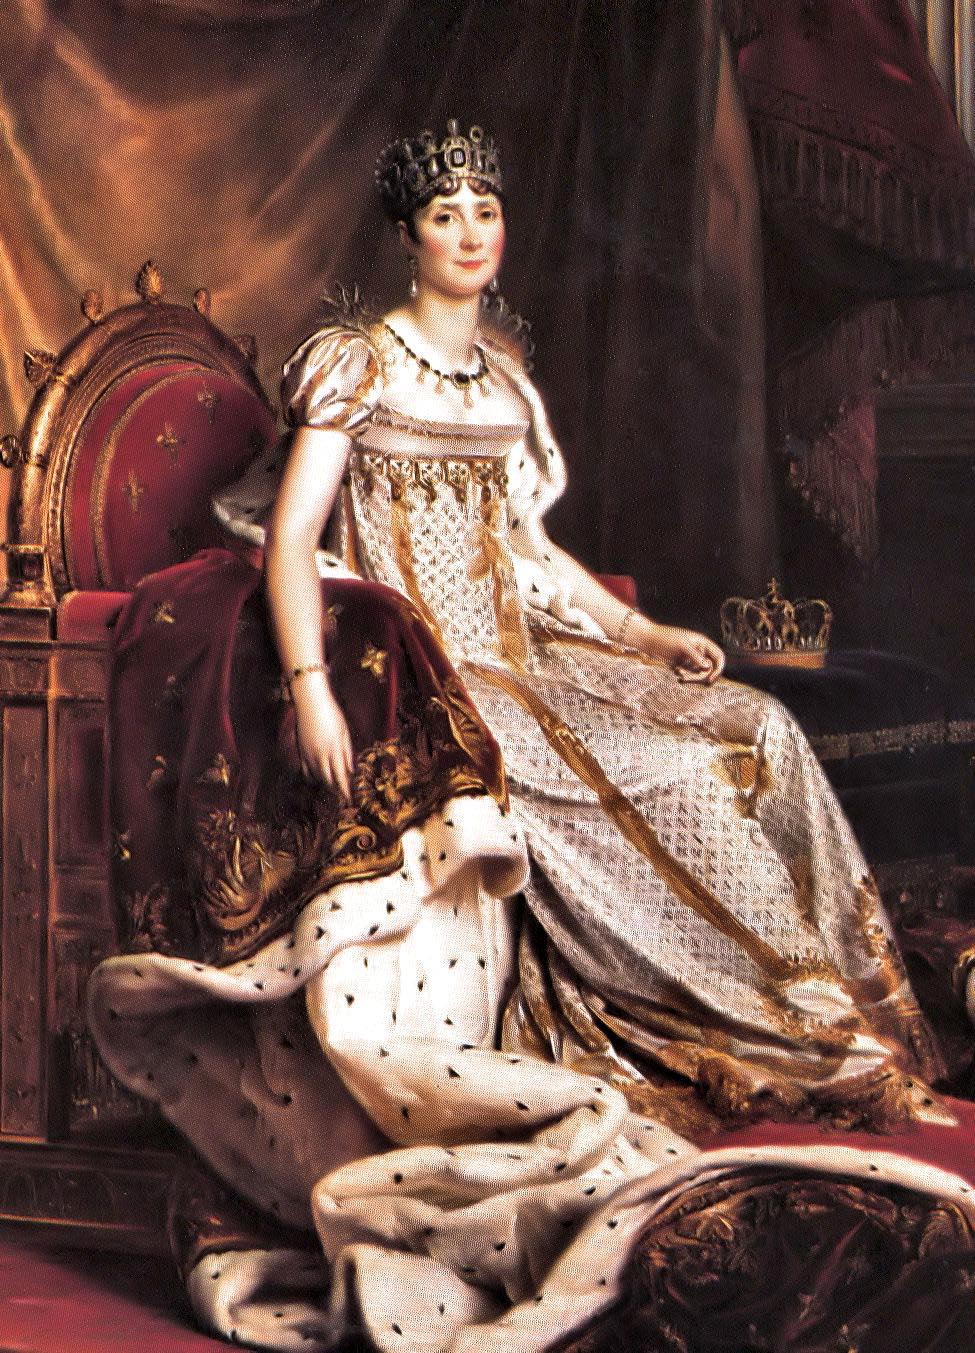 Napoleon's first wife, Joséphine